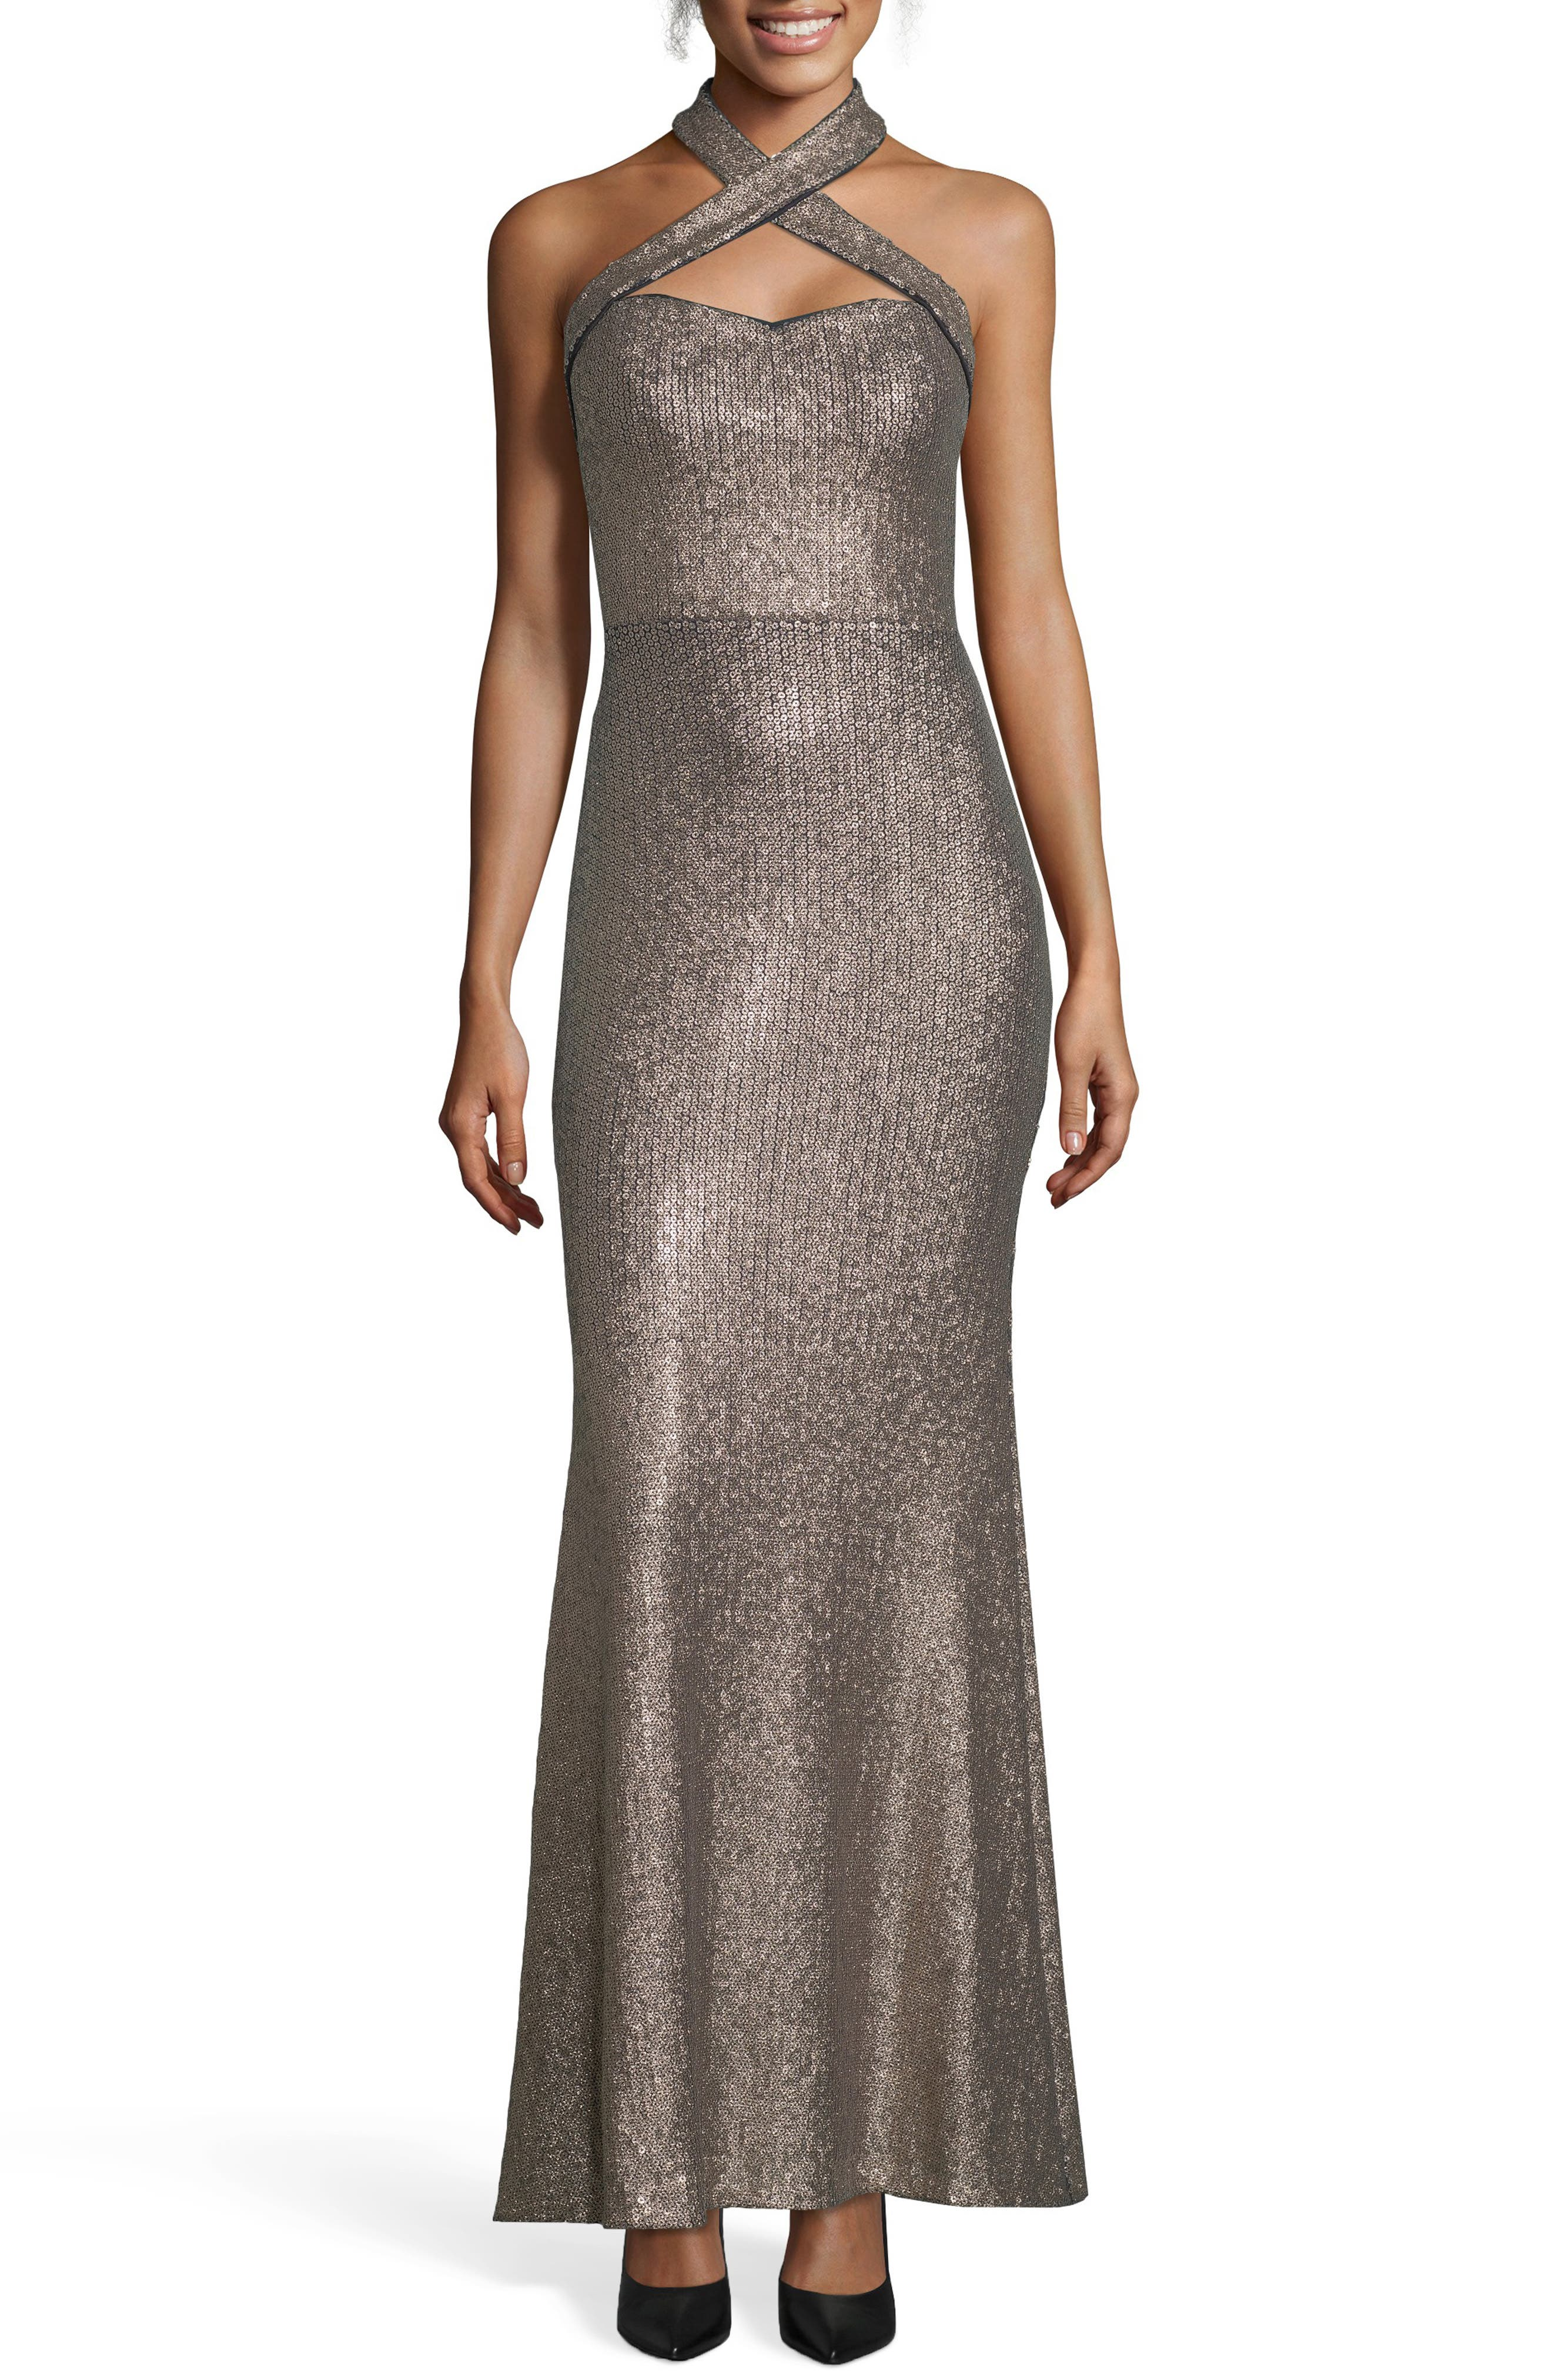 Crisscross Halter Neck Sequin Gown,                             Main thumbnail 1, color,                             GOLD/ NAVY